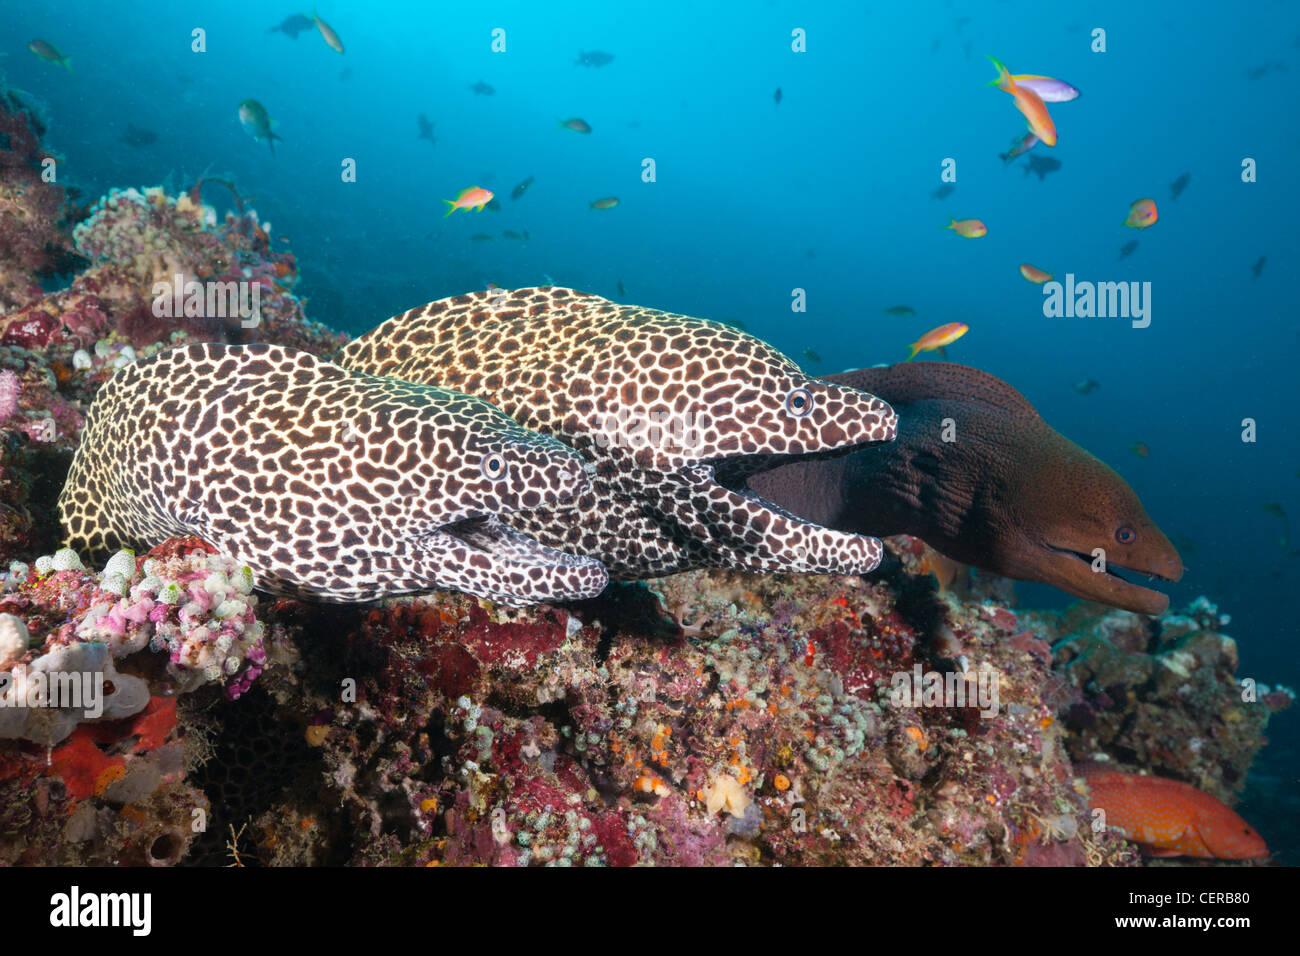 Pair of Honeycomb Moray, Gymnothorax favagineus, North Male Atoll, Indian Ocean, Maldives Stock Photo